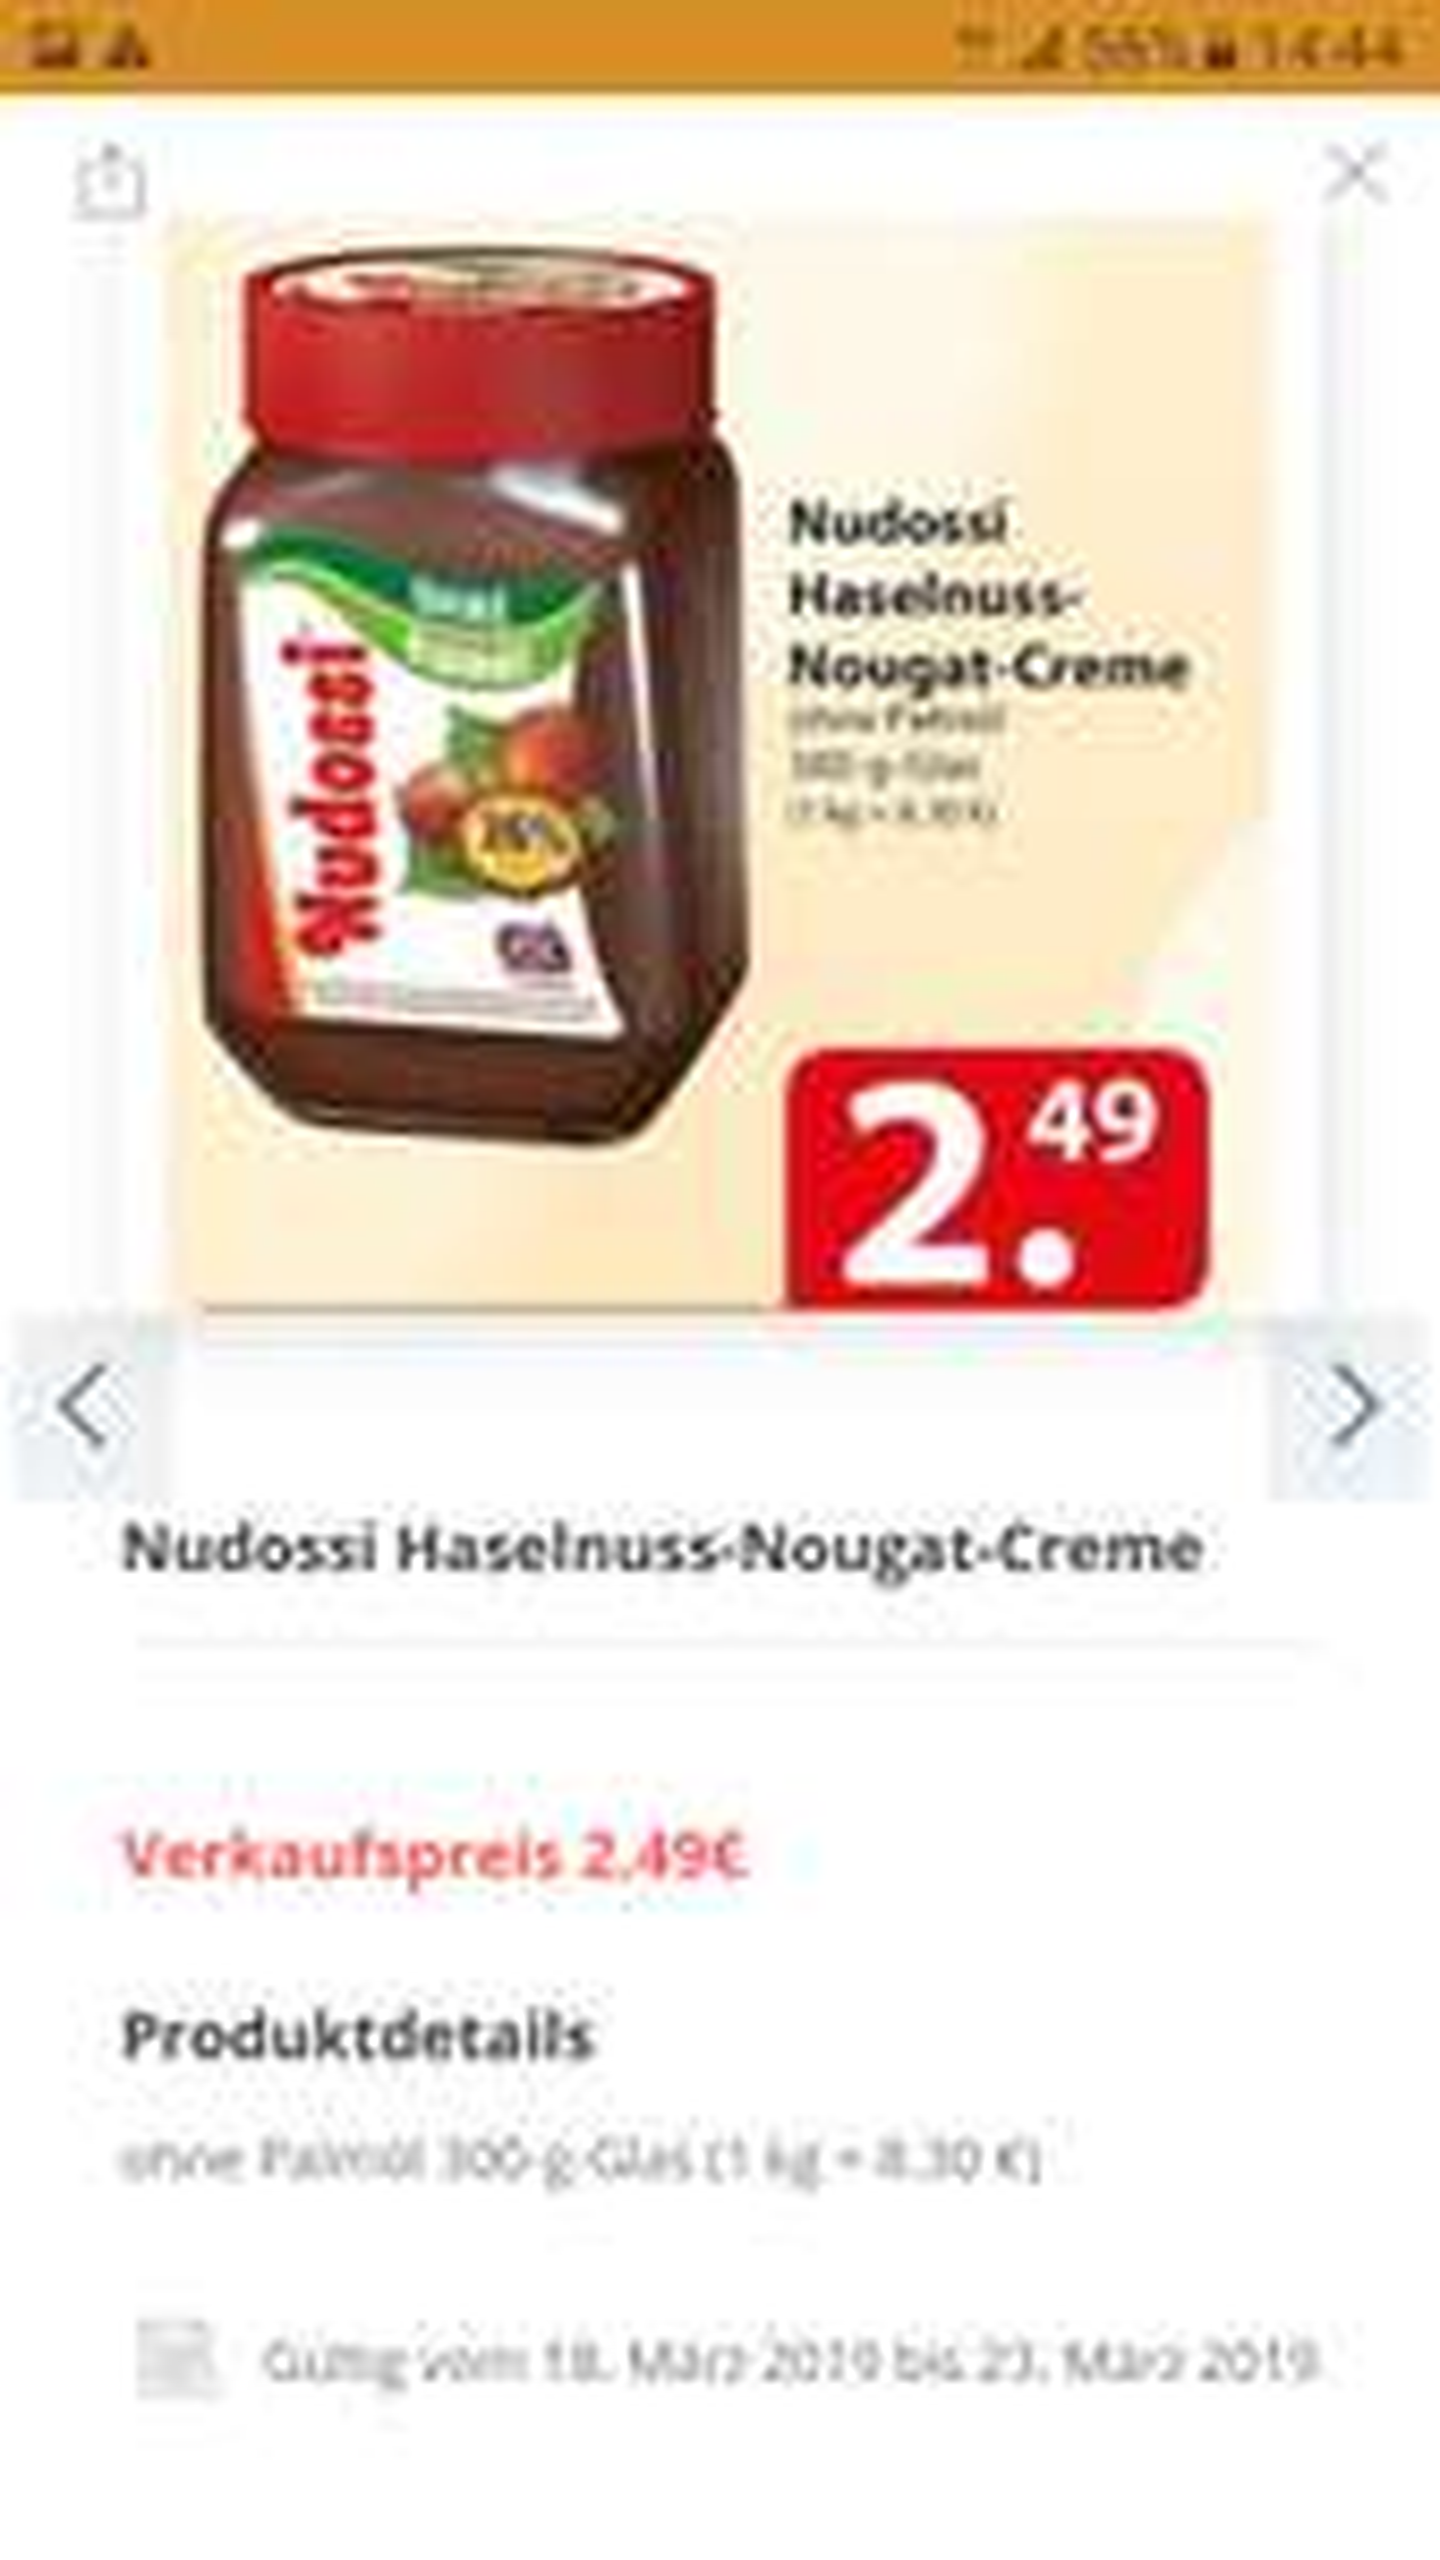 Famila Nordost Nudossi 300g 2.49€